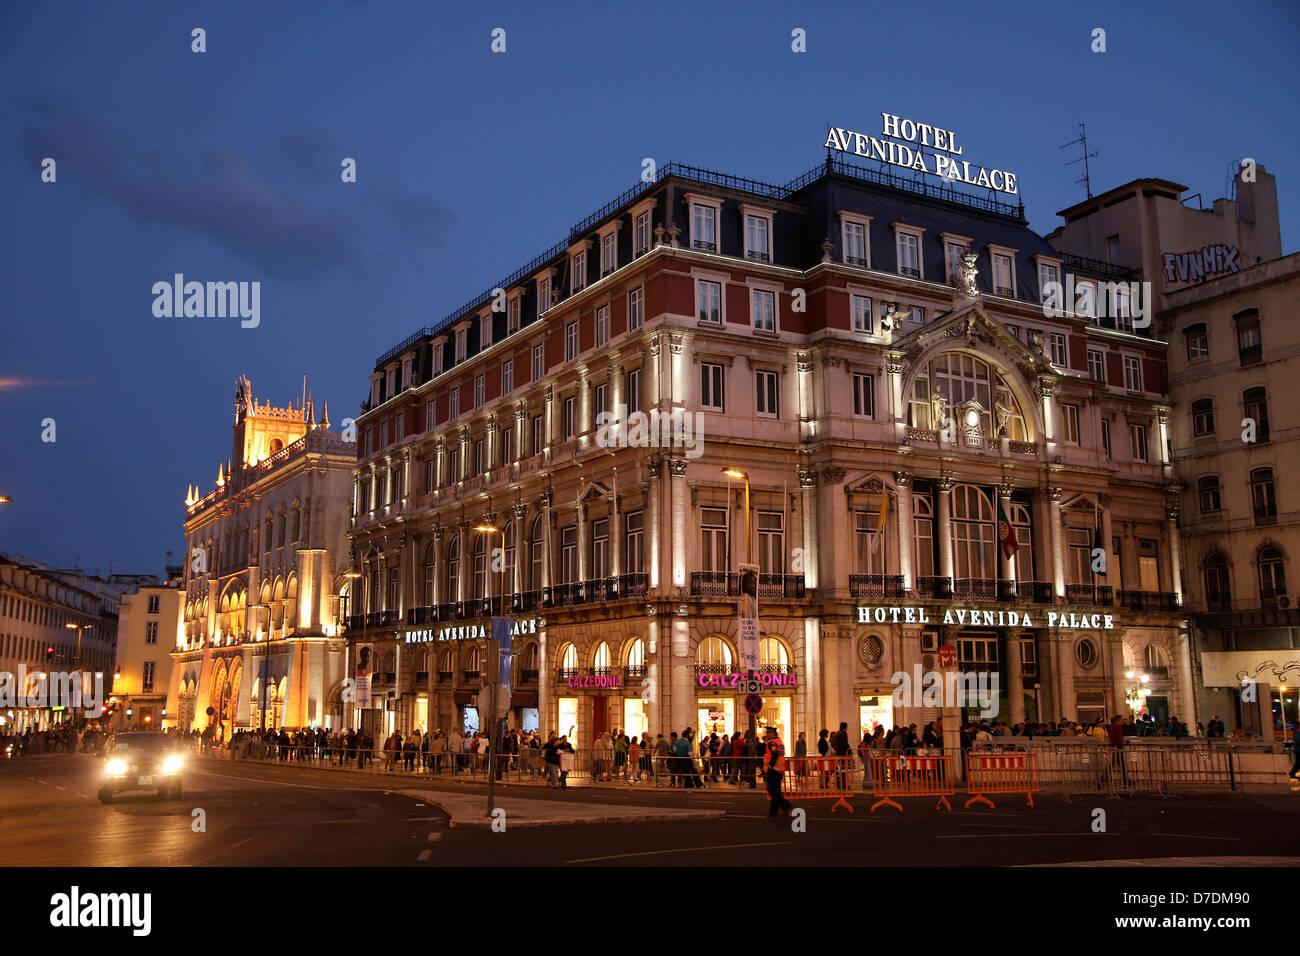 Hotel Avenida Palace in Lissabon bei Nacht, , Europa | Hotel Avenida Palace in Lisbon at night, , Europe - Stock Image